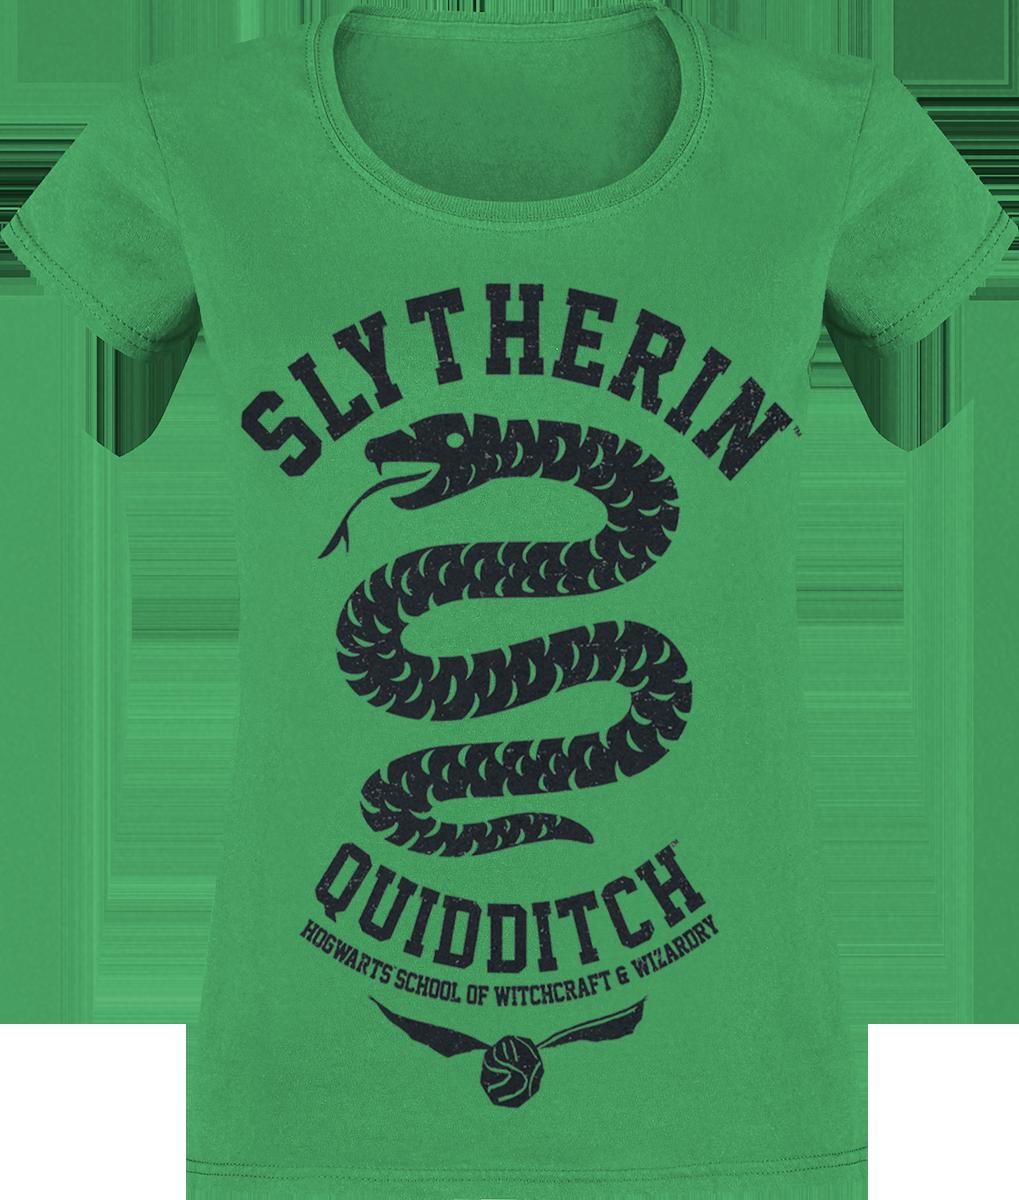 Harry Potter - Slytherin - Quidditch - T-Shirt - grün